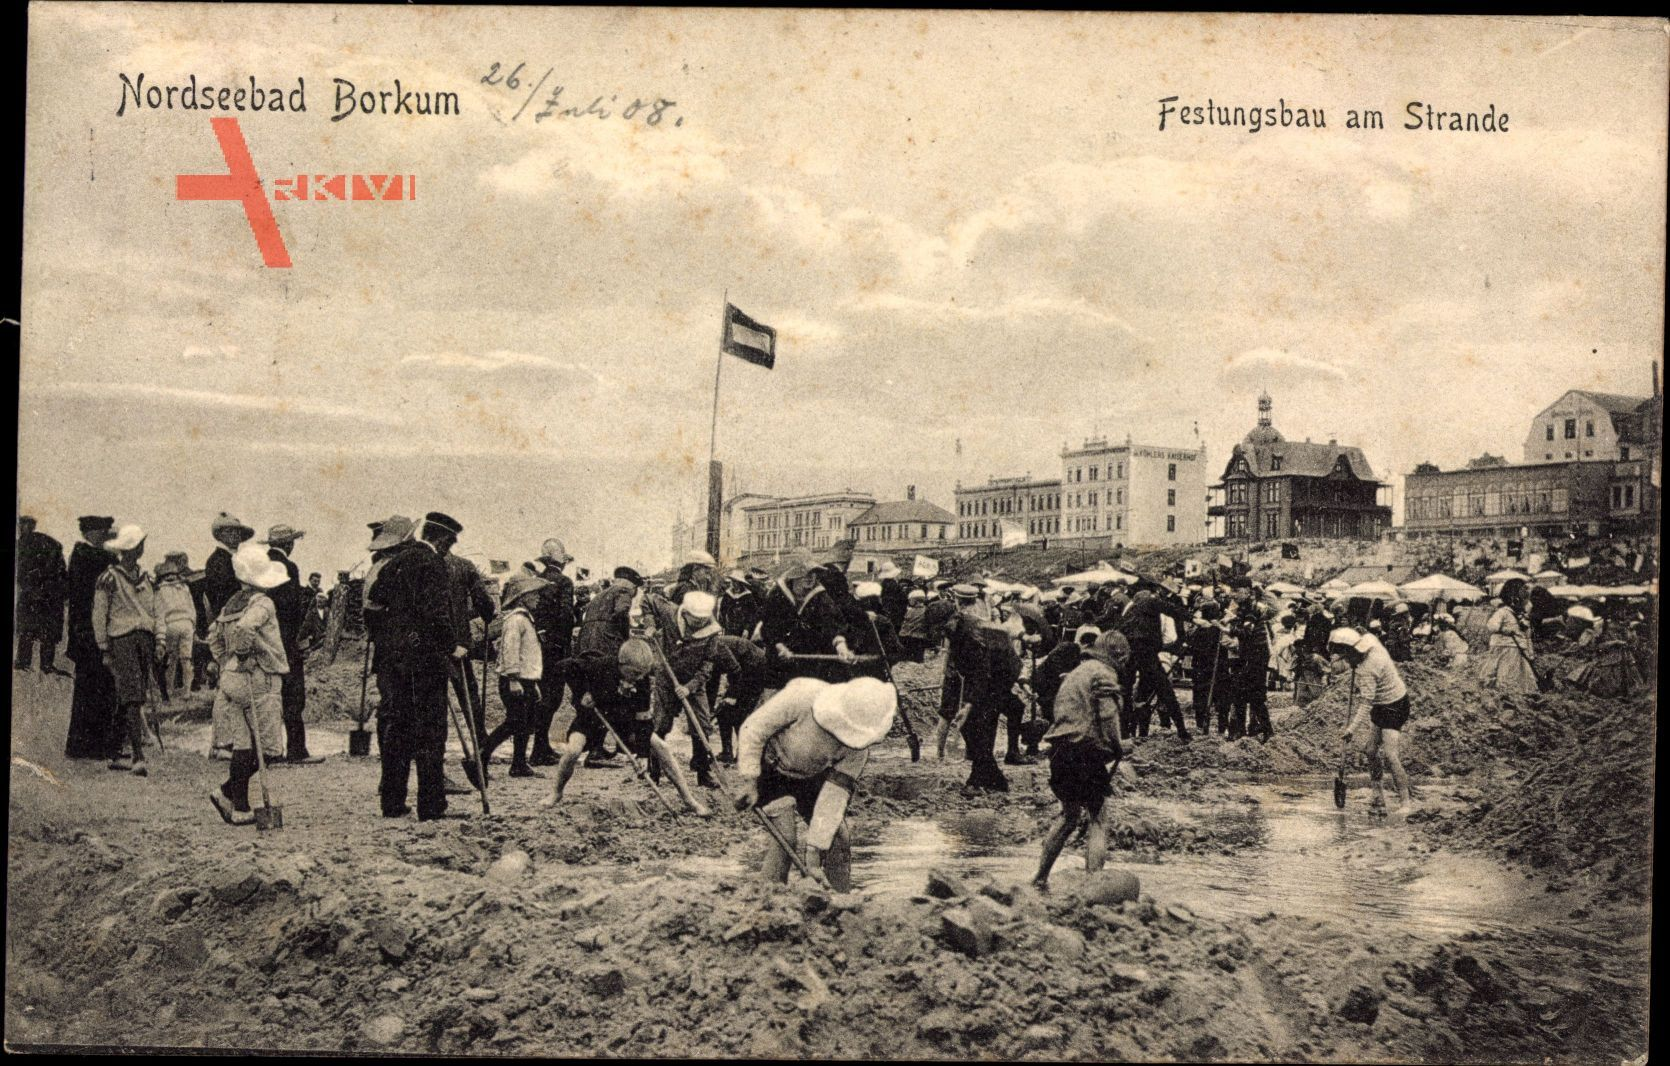 Insel Borkum im Kreis Leer, Nordseebad, Festungsgbau am Strande